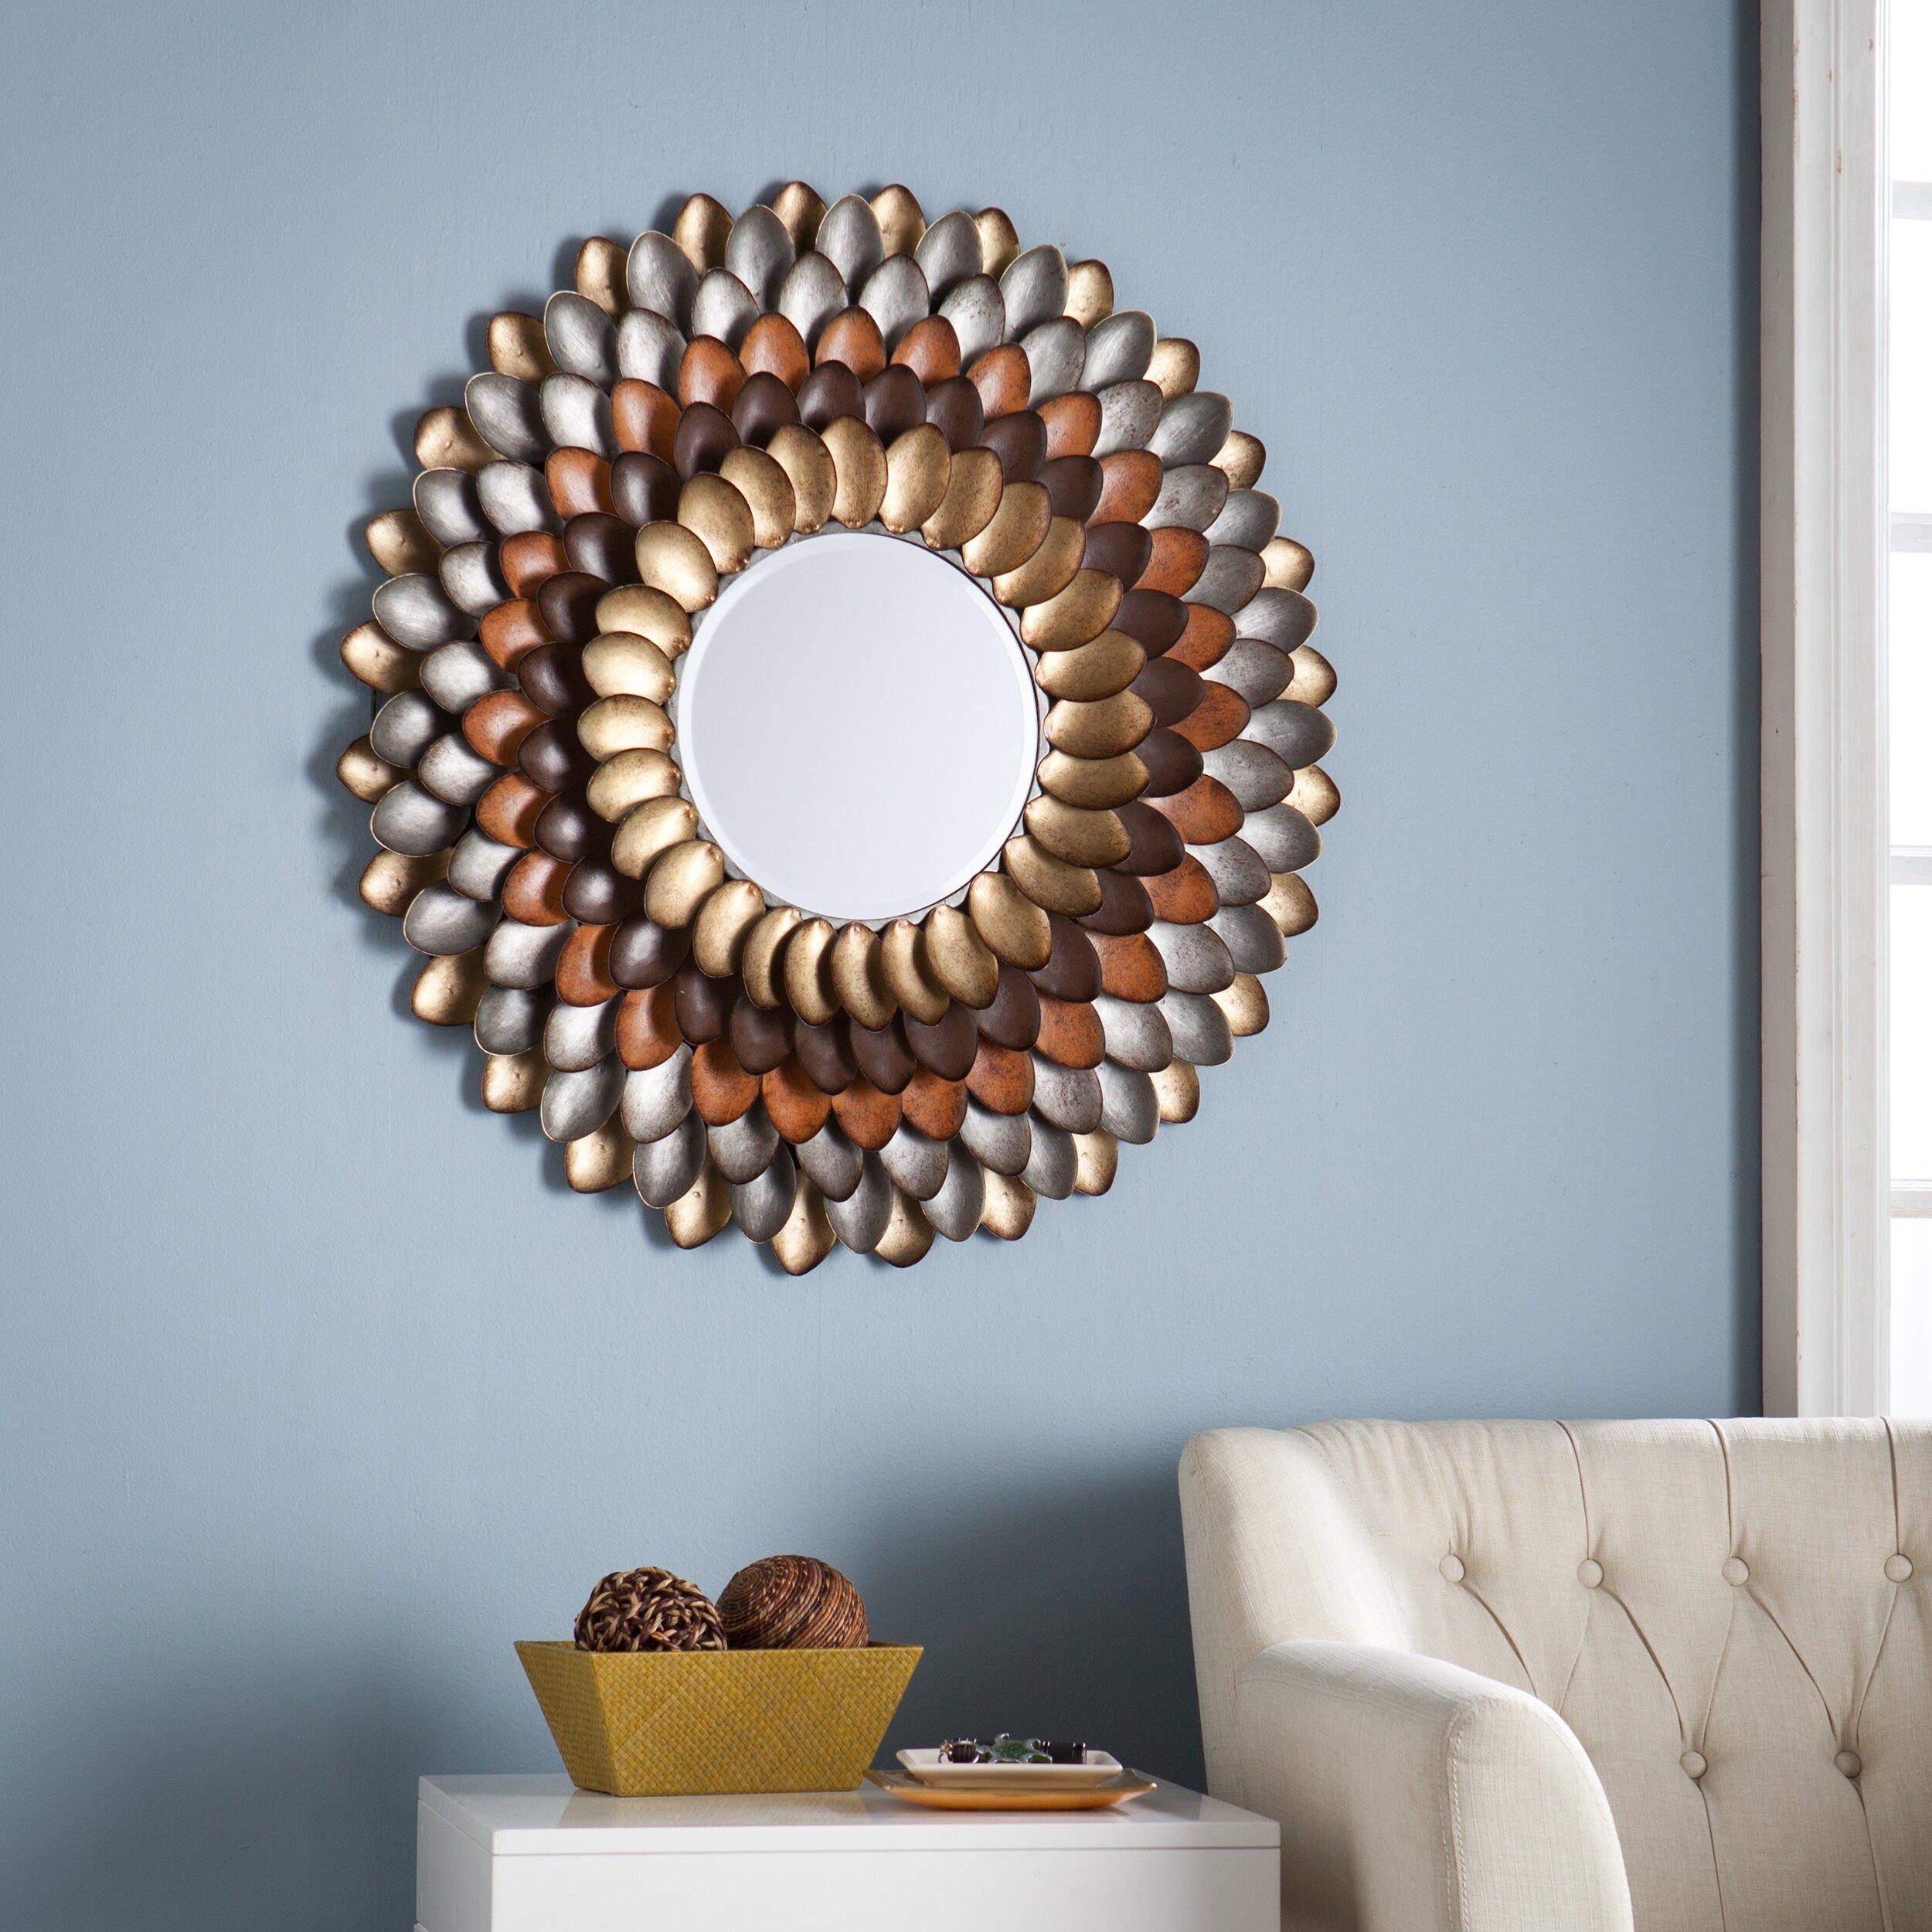 Wildon Home ® Abrams Decorative Round Wall Mirror ...